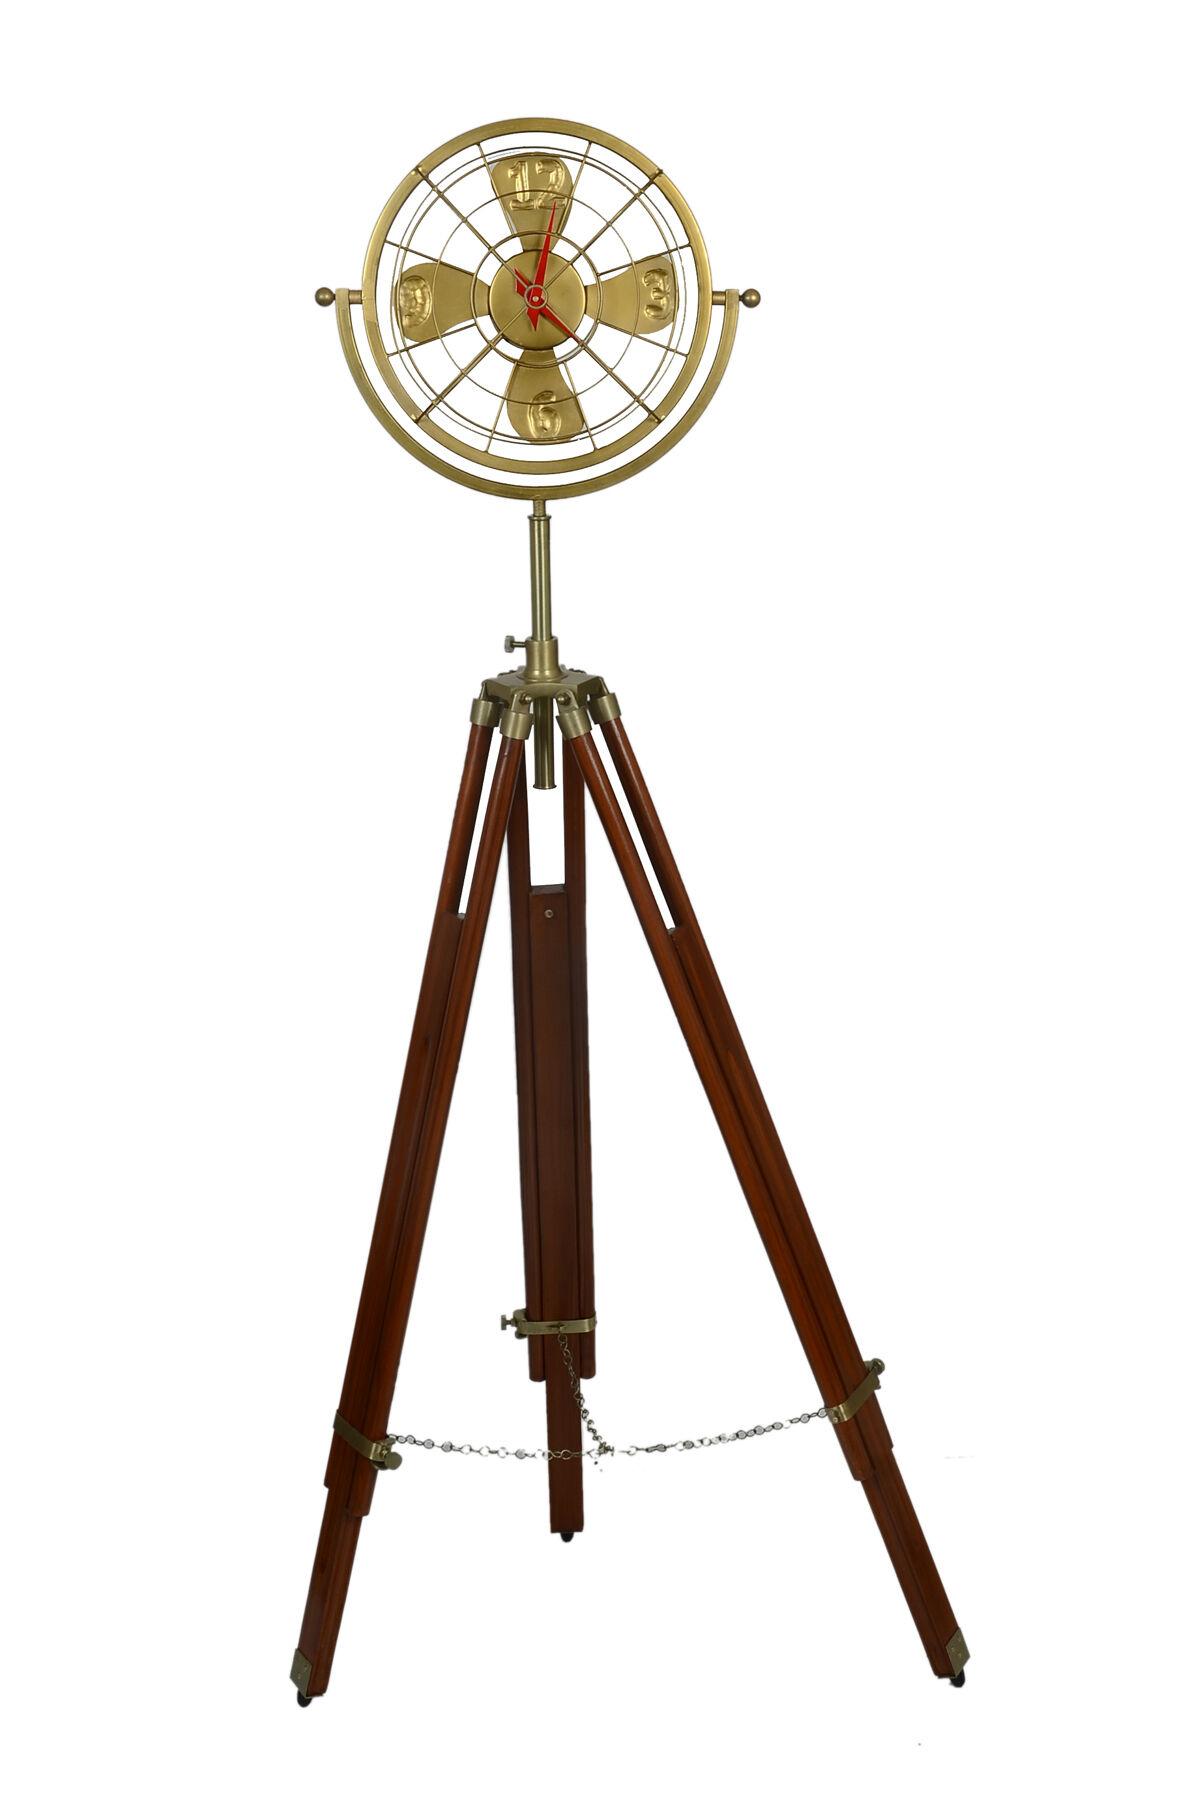 ArtizayIndia Rose Wood Tripod Stand Metal Fan Clock Vintage Retro Steampunk Unique